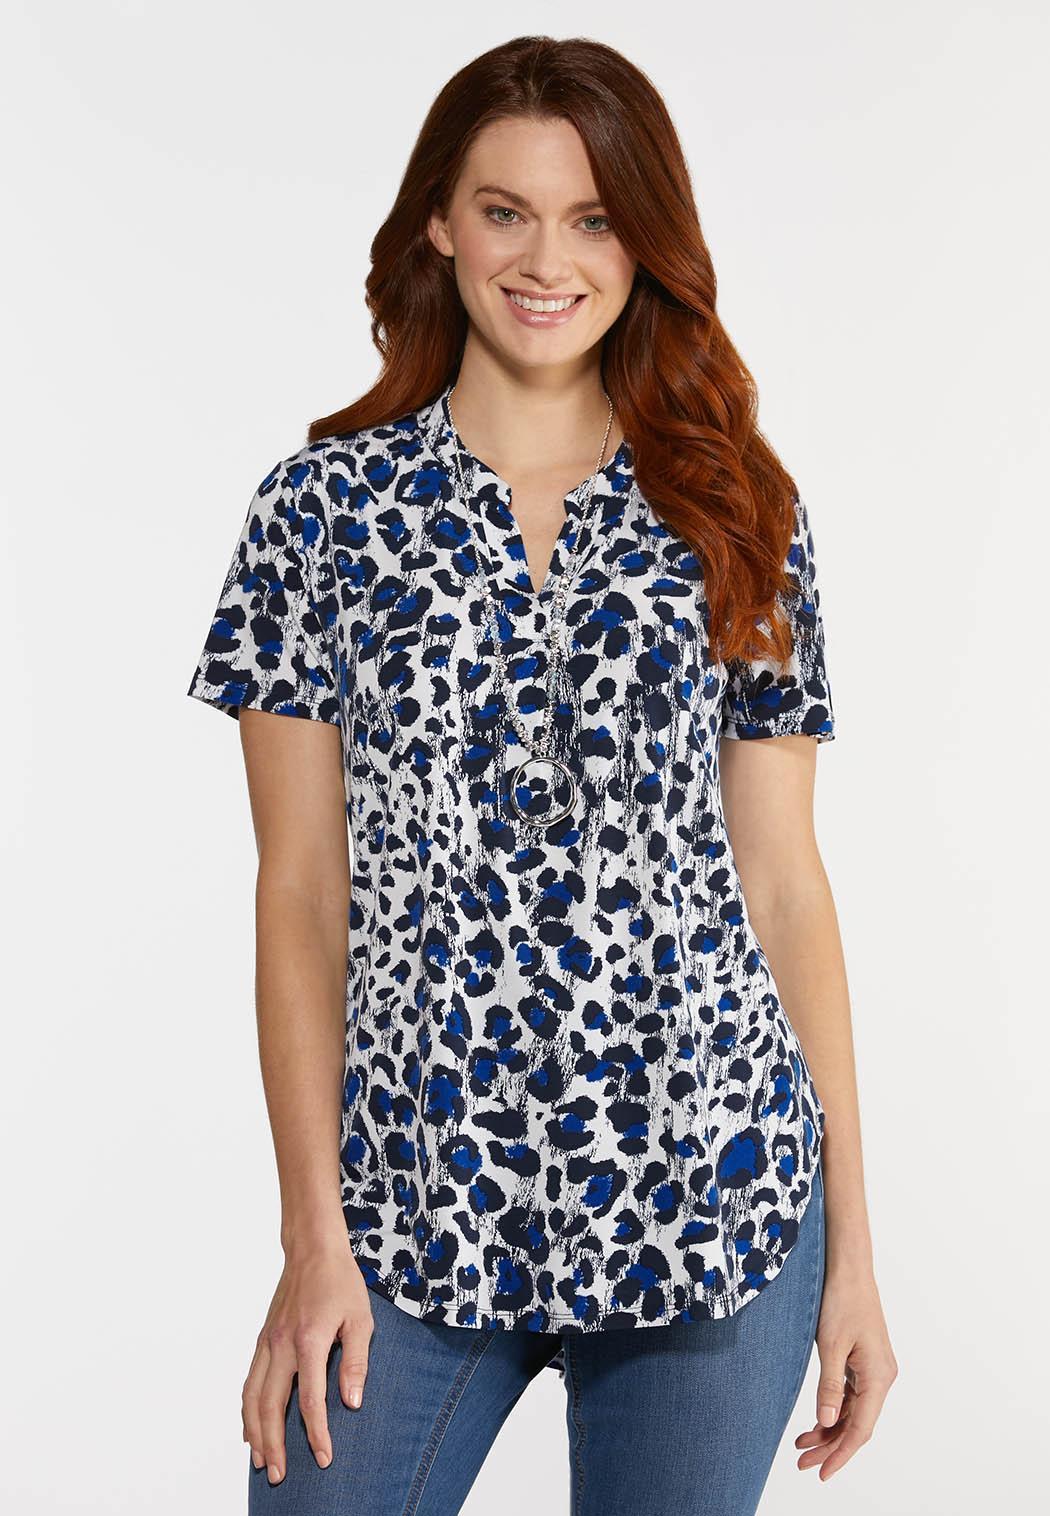 Blue Leopard Top